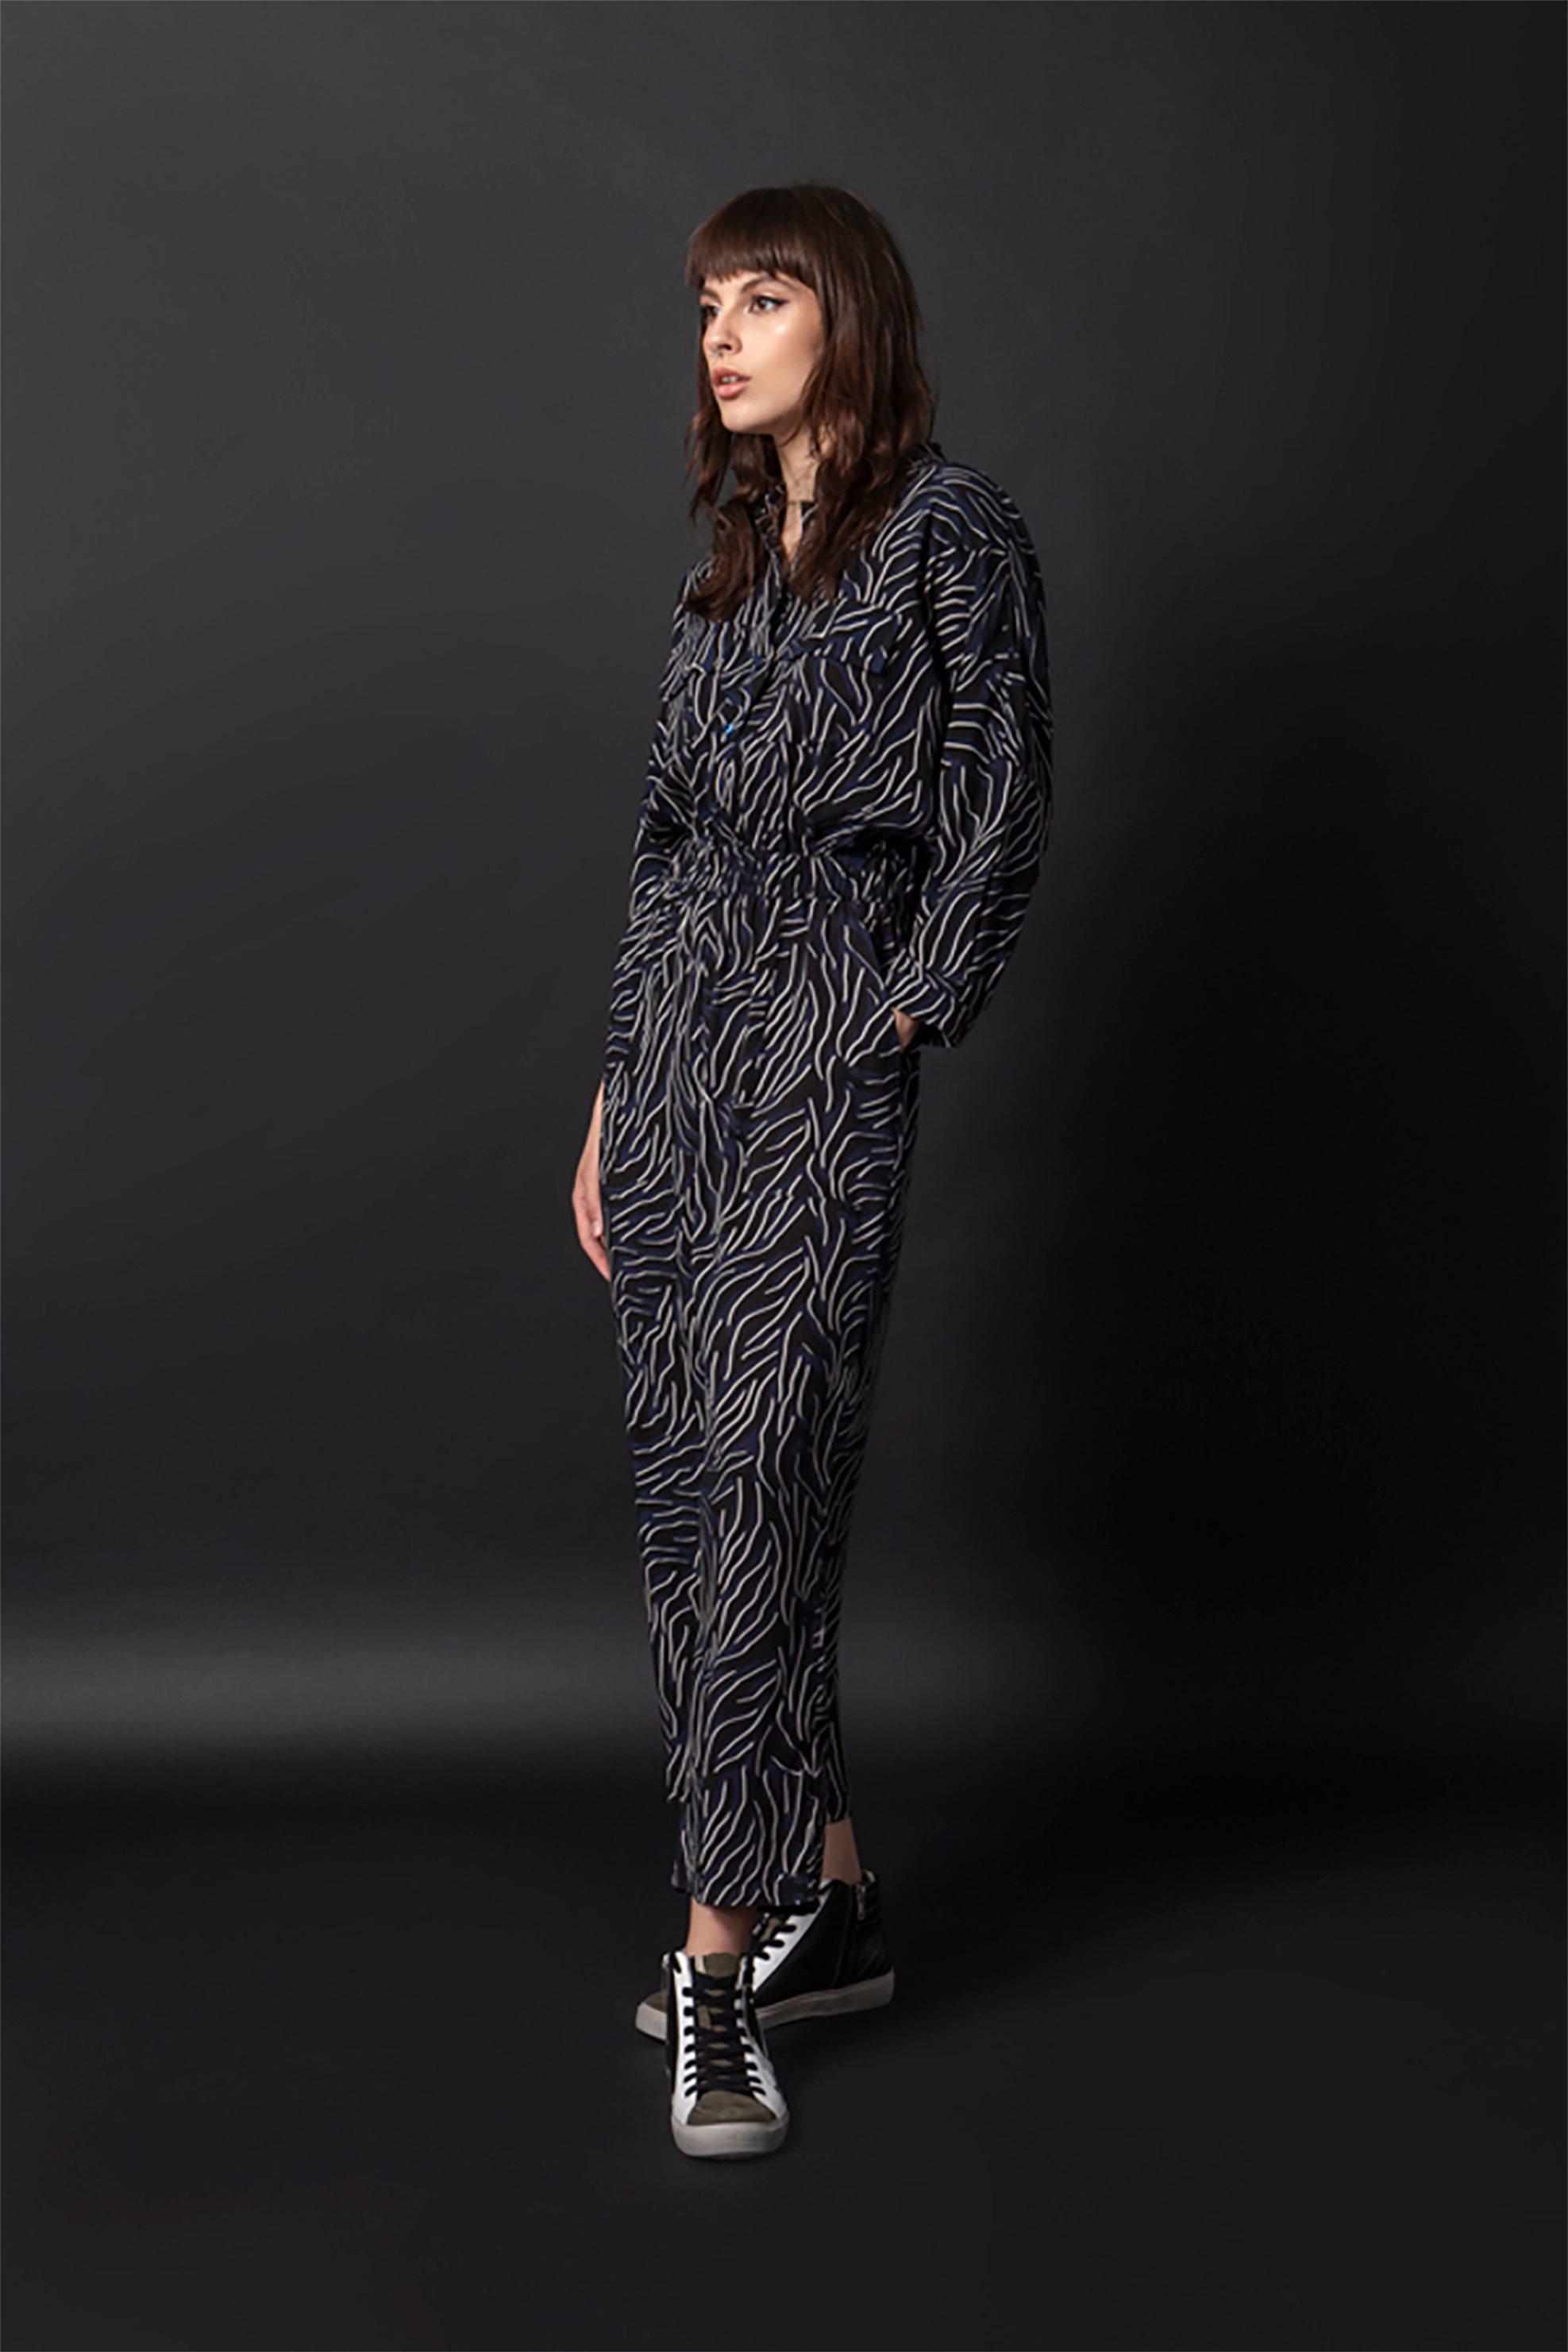 Helmi γυναικεία ολόσωμη φόρμα με μάο γιακά και all-over print - 48-25-004 - Μπλε Σκούρο